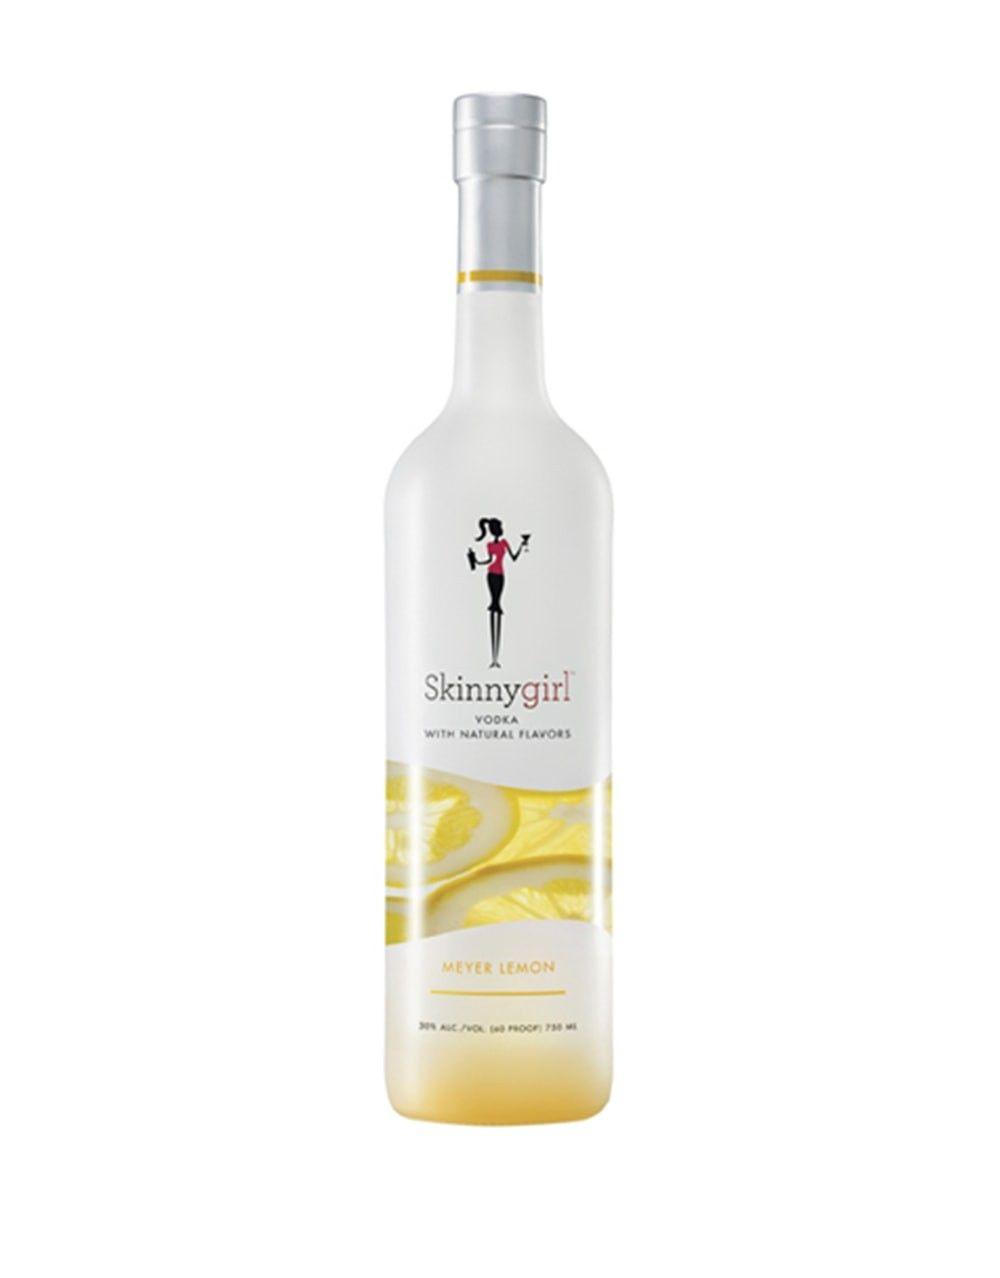 Skinnygirl Meyer Lemon Vodka  Buy Online or Send as a